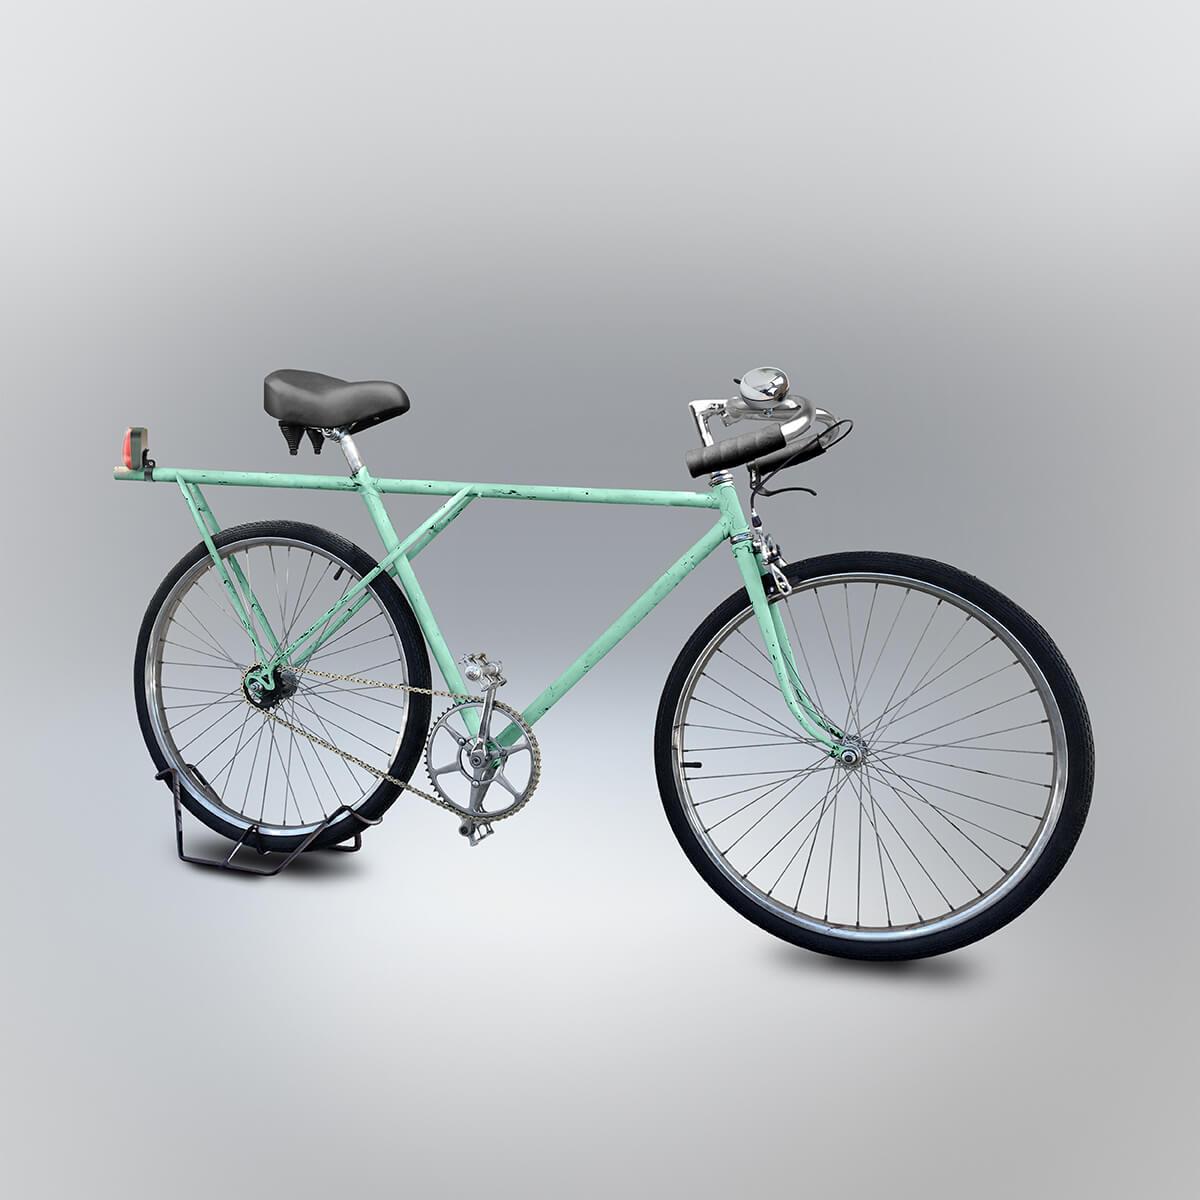 gianluca-gimini-bikes-8